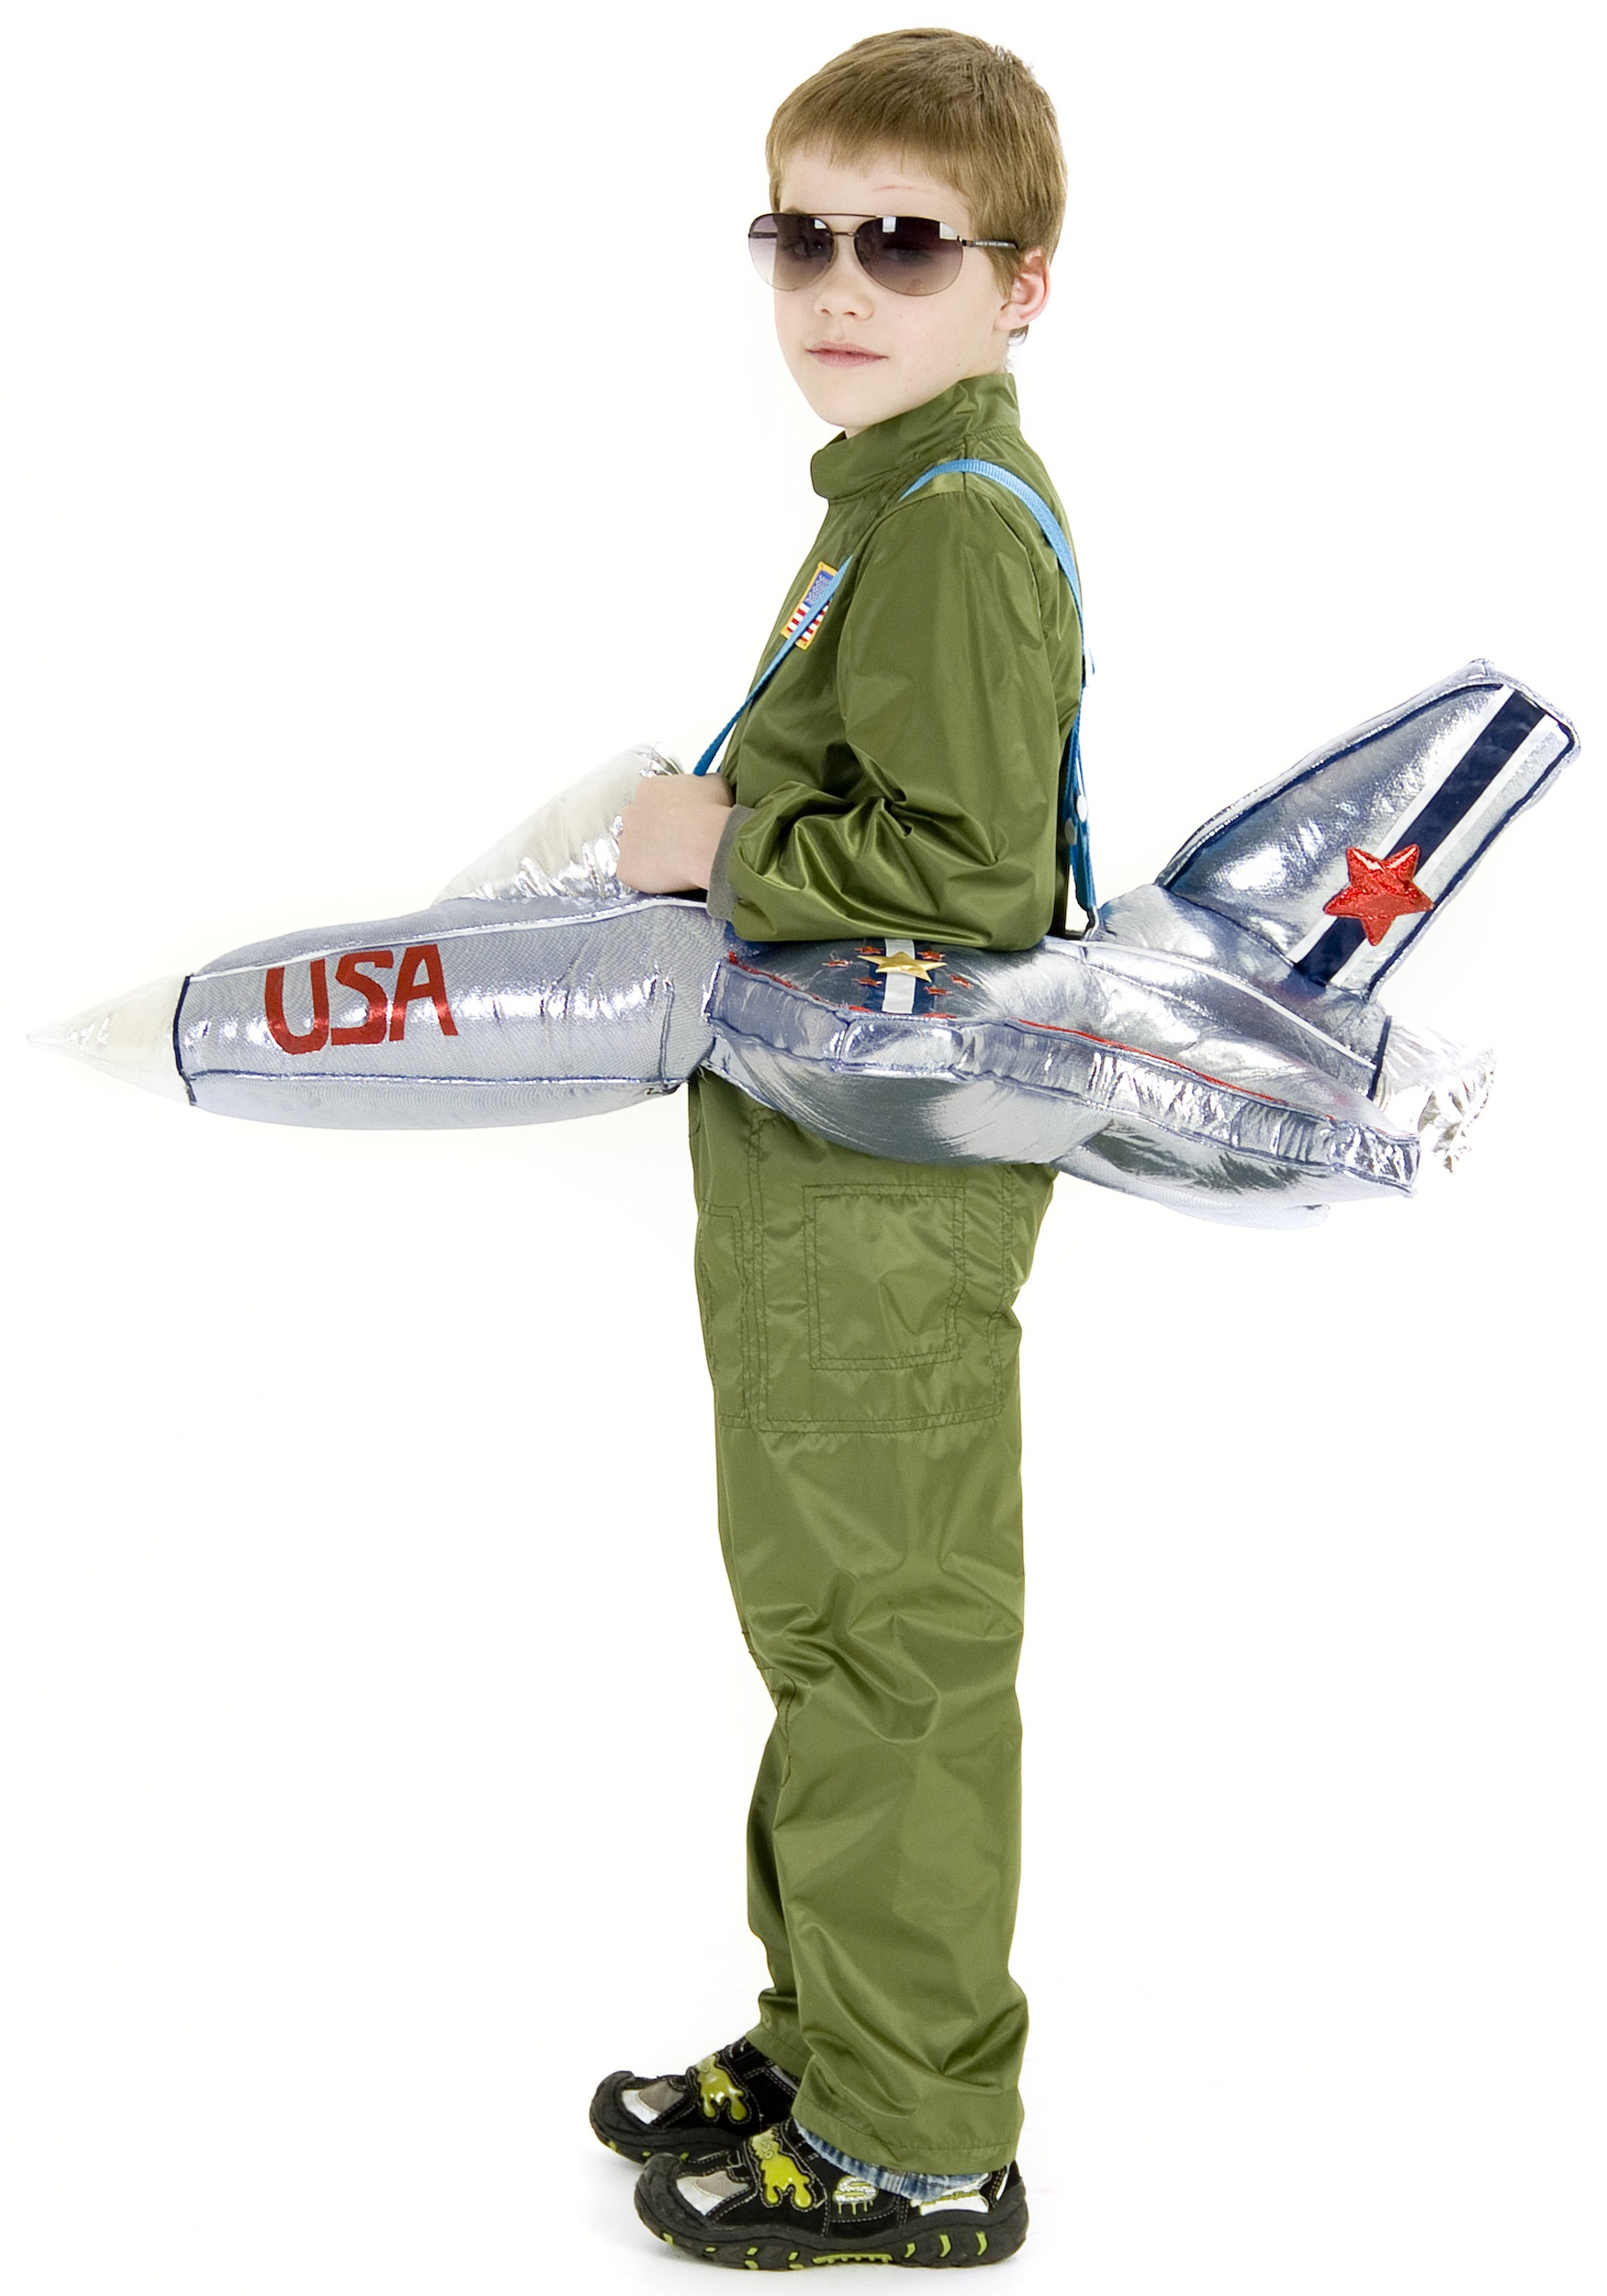 Boys Airplane Ride Costume  sc 1 st  Halloween Costume & Boys Airplane Ride Costume - Toddler Pilot Halloween Costume Ideas